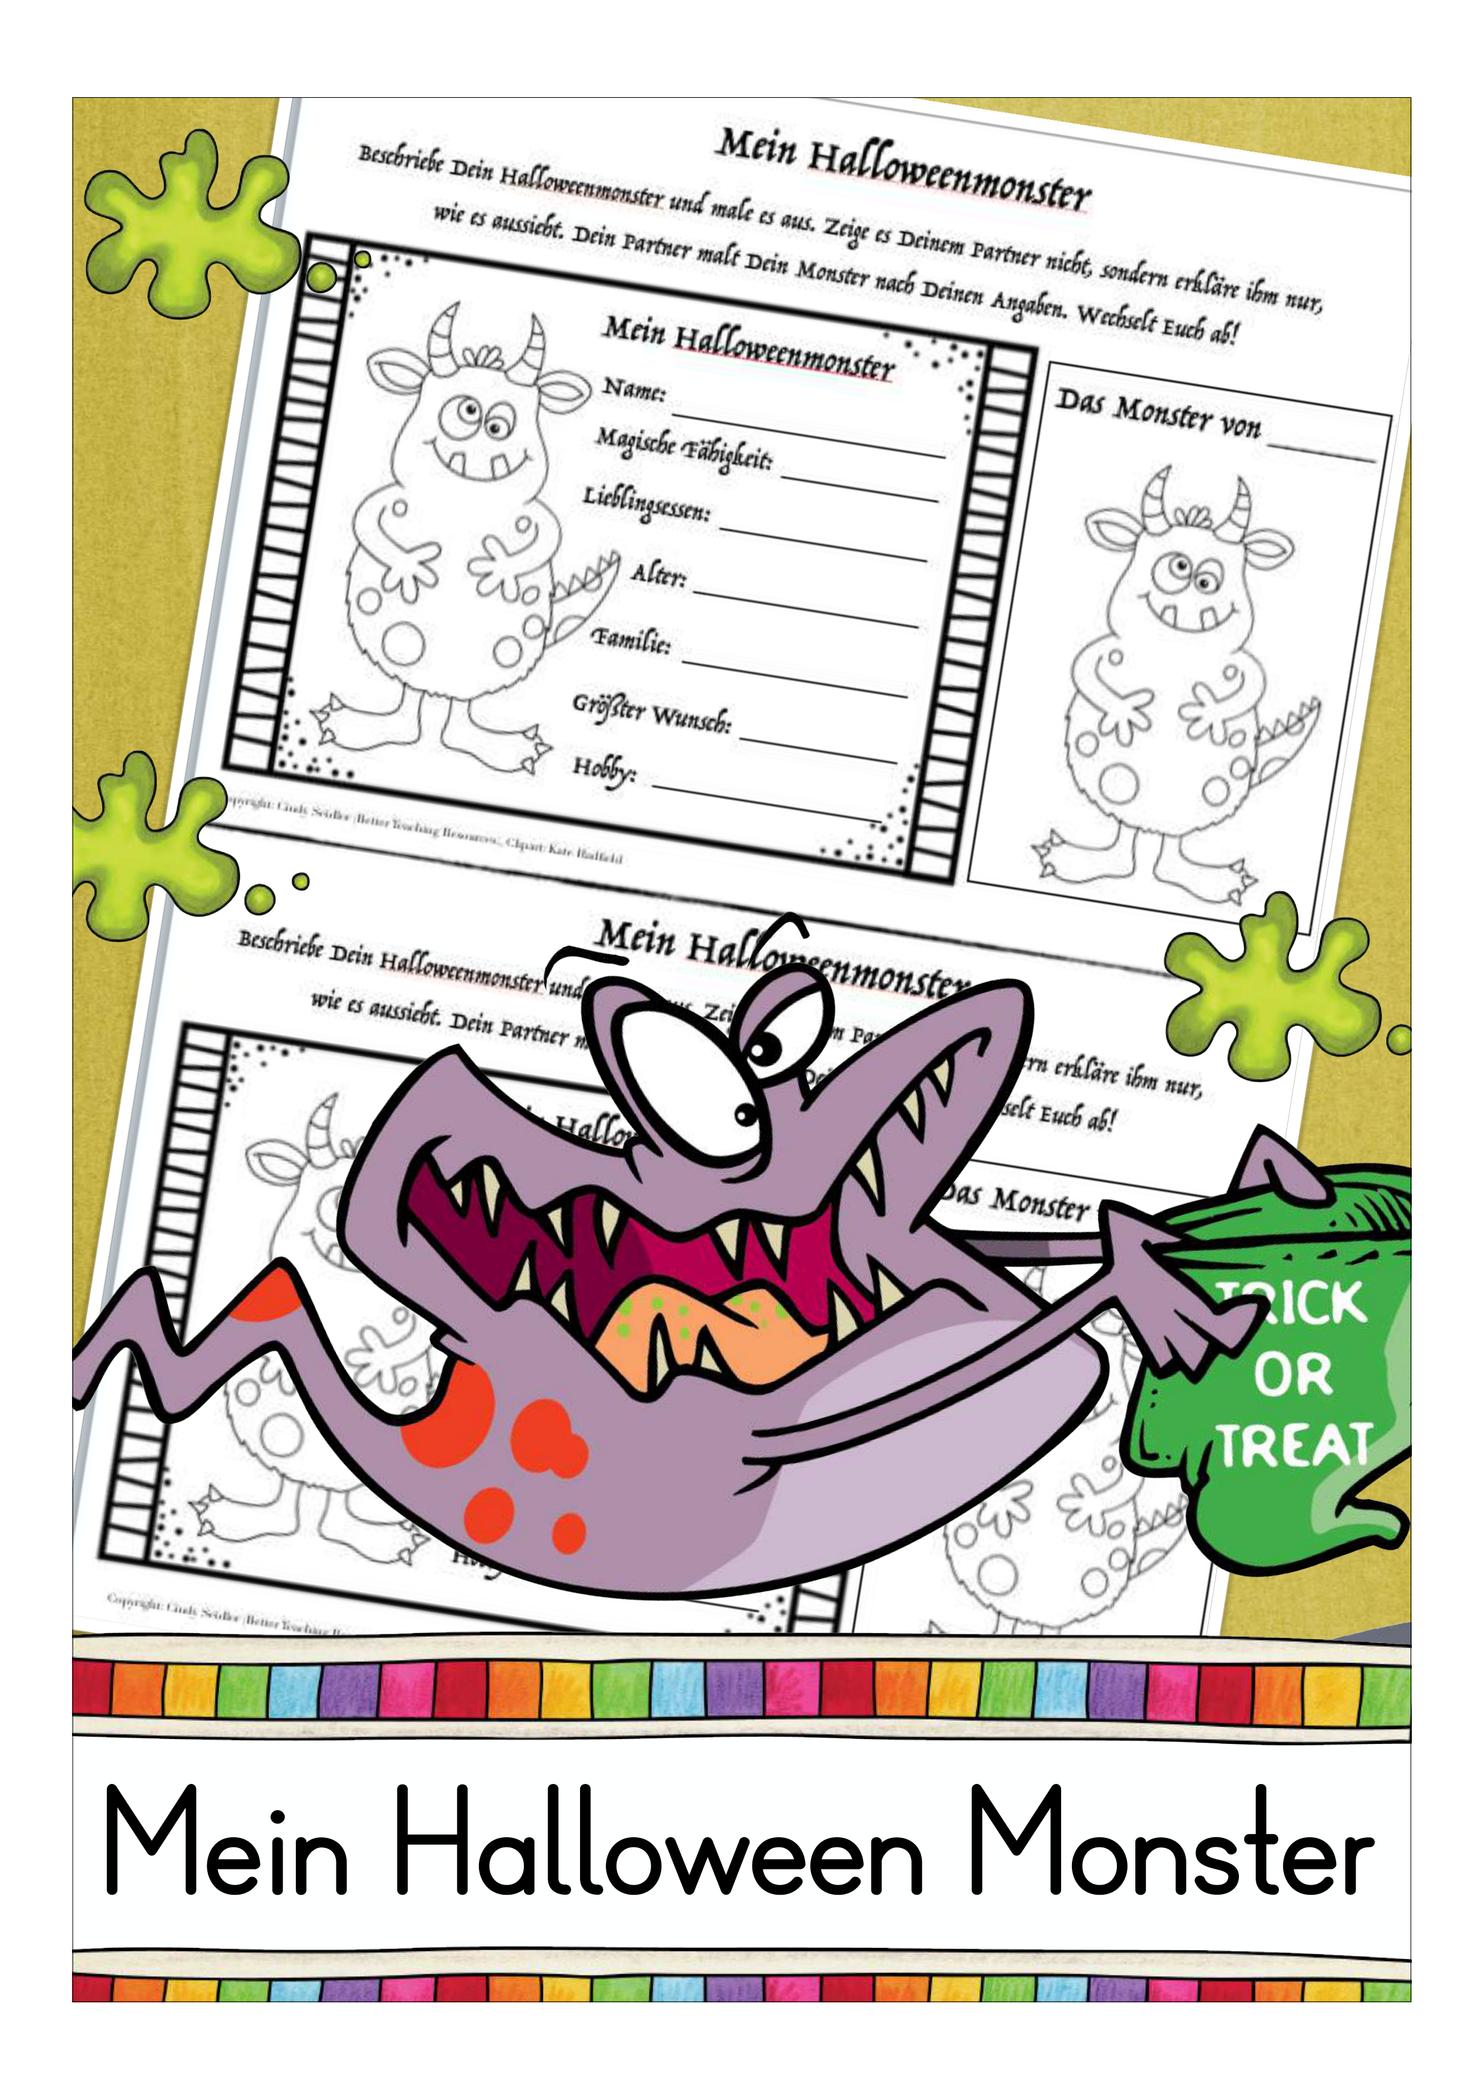 Halloween Monster Unterrichtsmaterial In Den Fachern